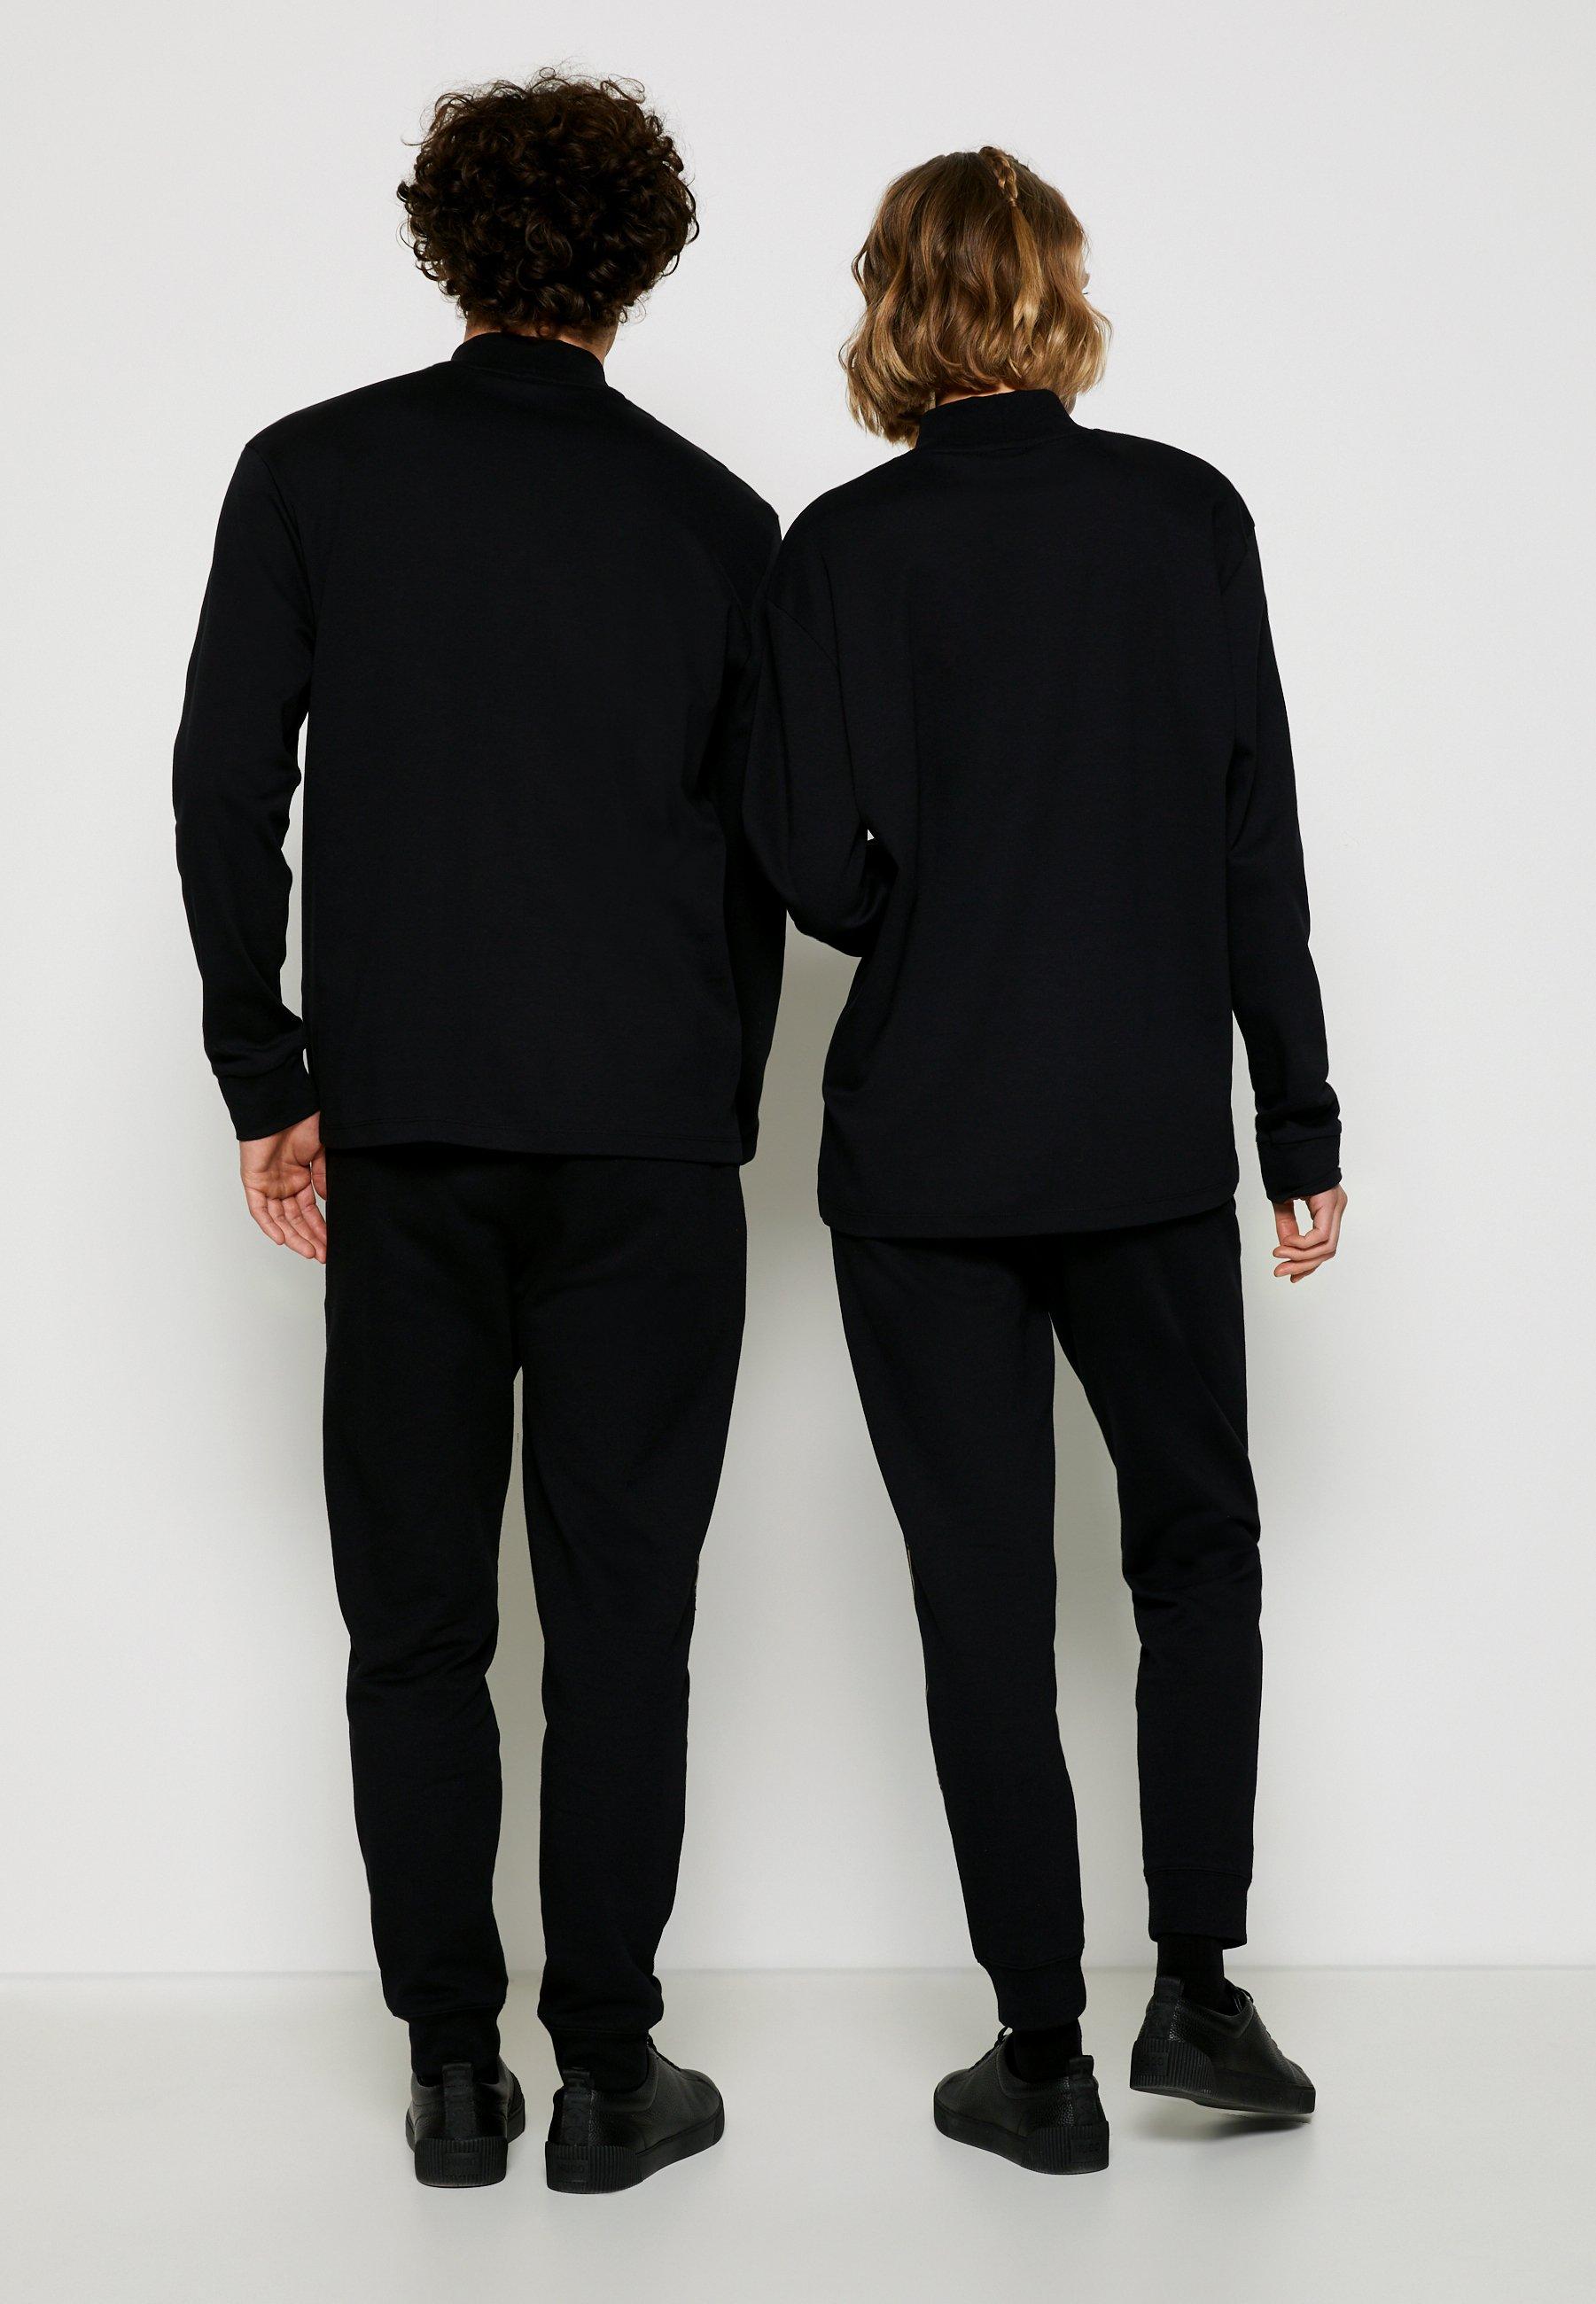 Homme DISAMU METALLIC UNISEX - T-shirt à manches longues